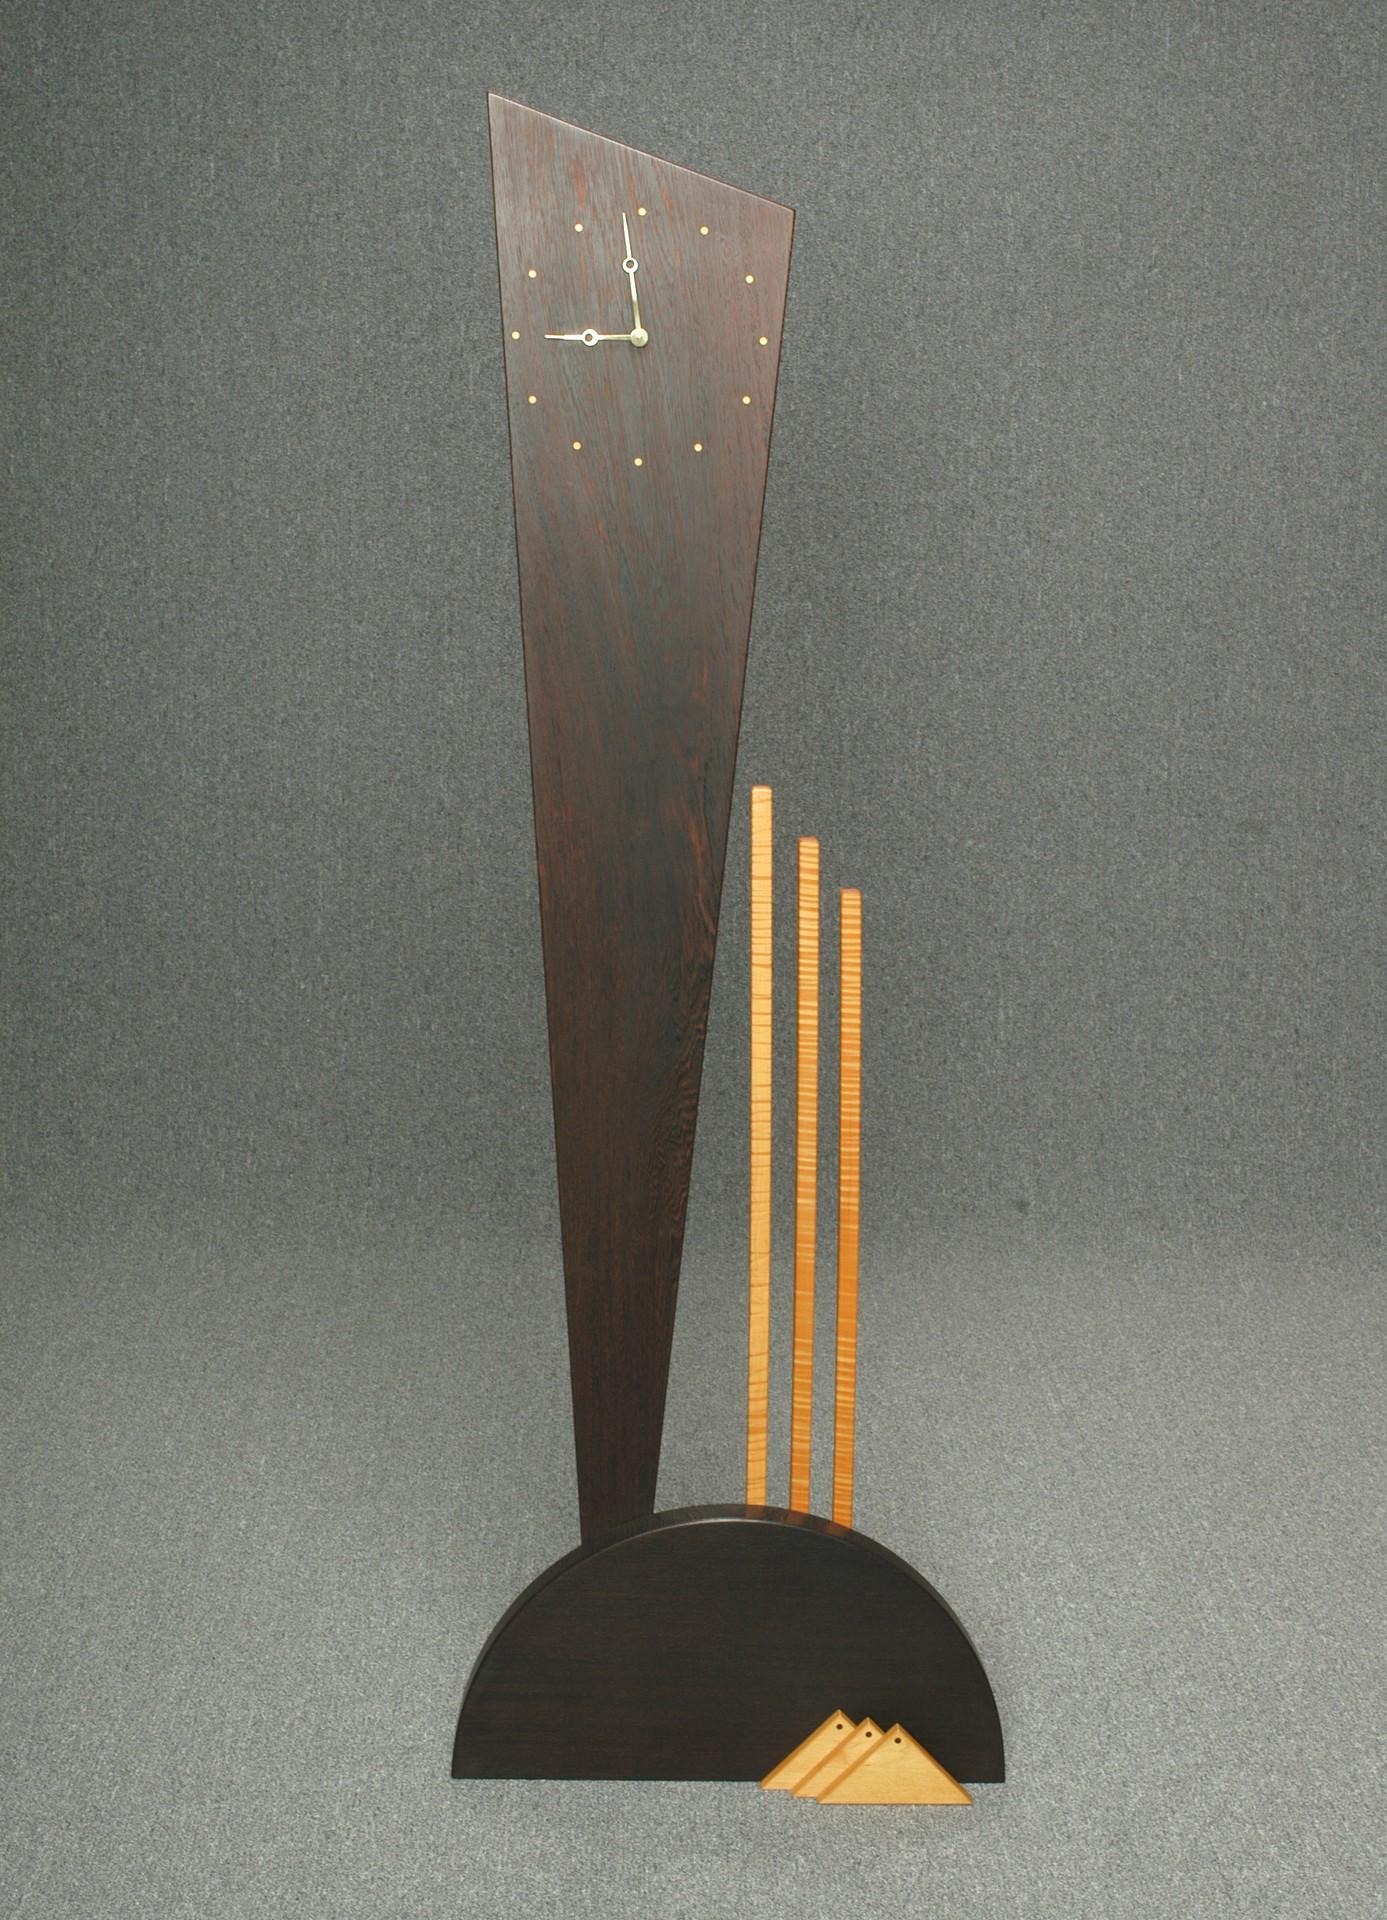 Sundial Clock Image